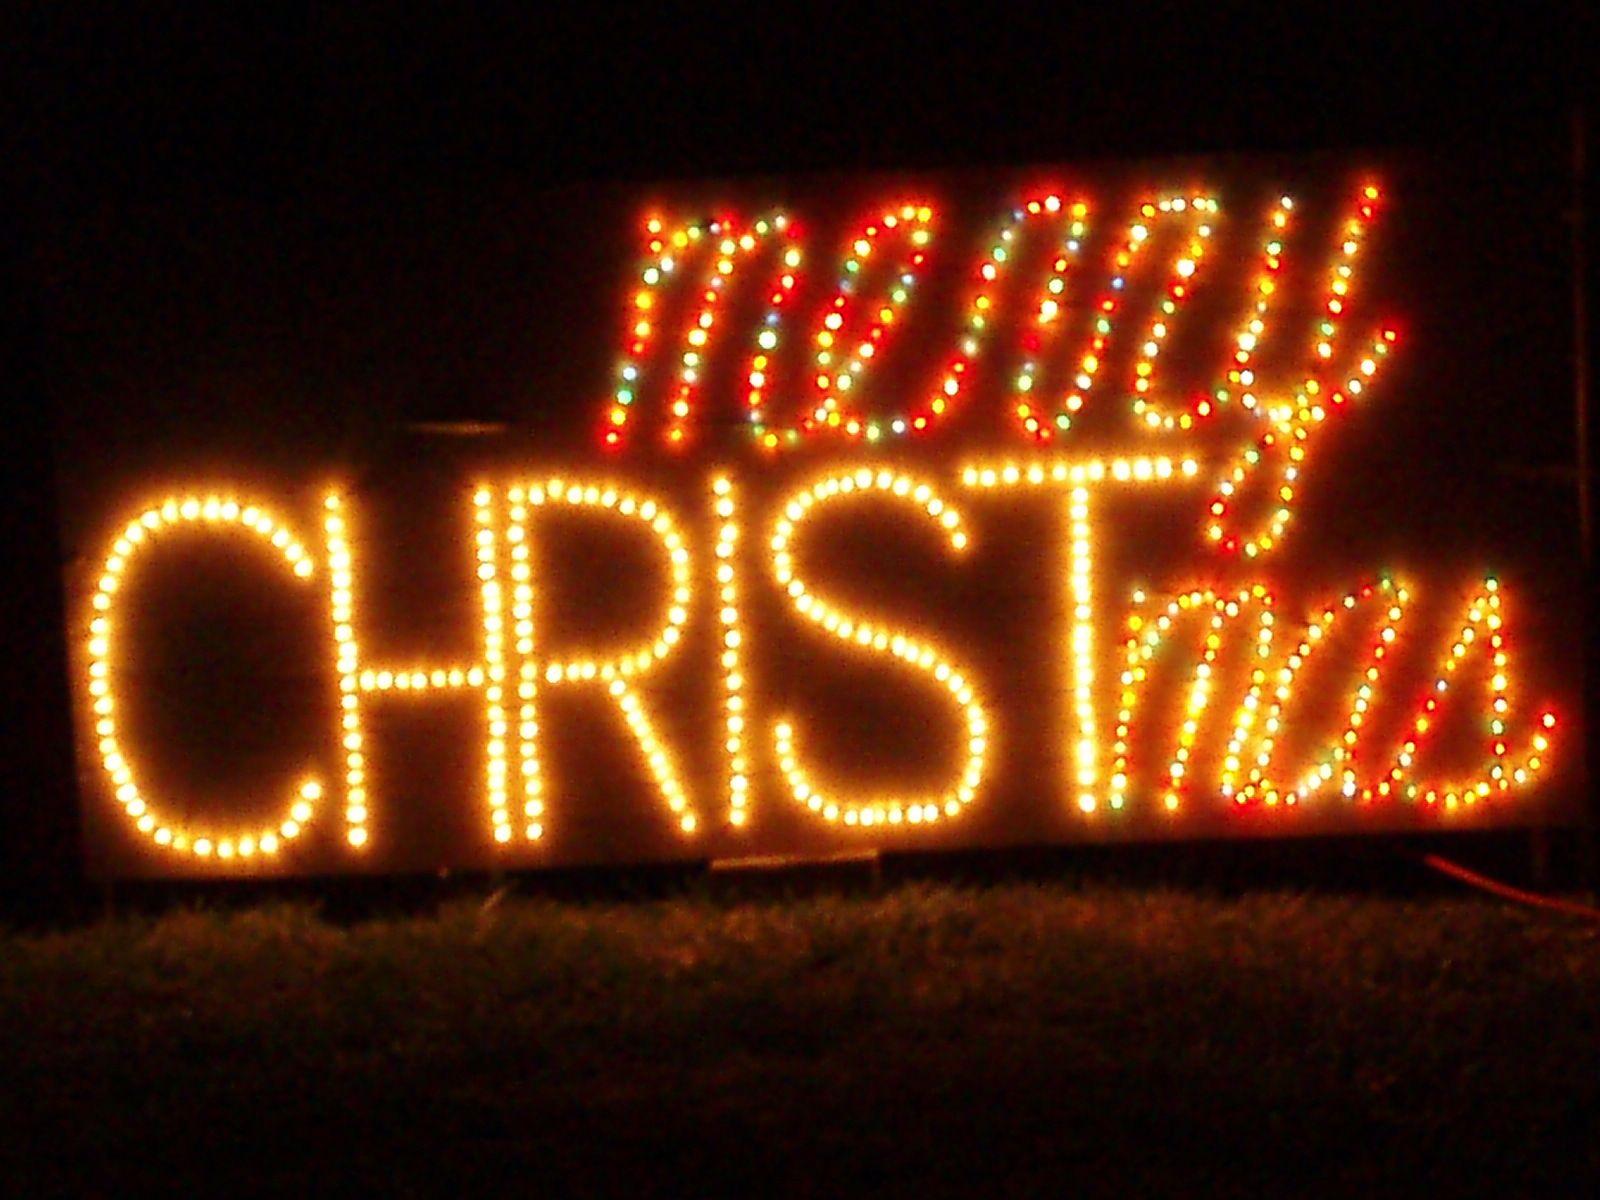 Christmas Lighted Sign.Merry Christmas Sign One Of My Favorite Christmas Lights